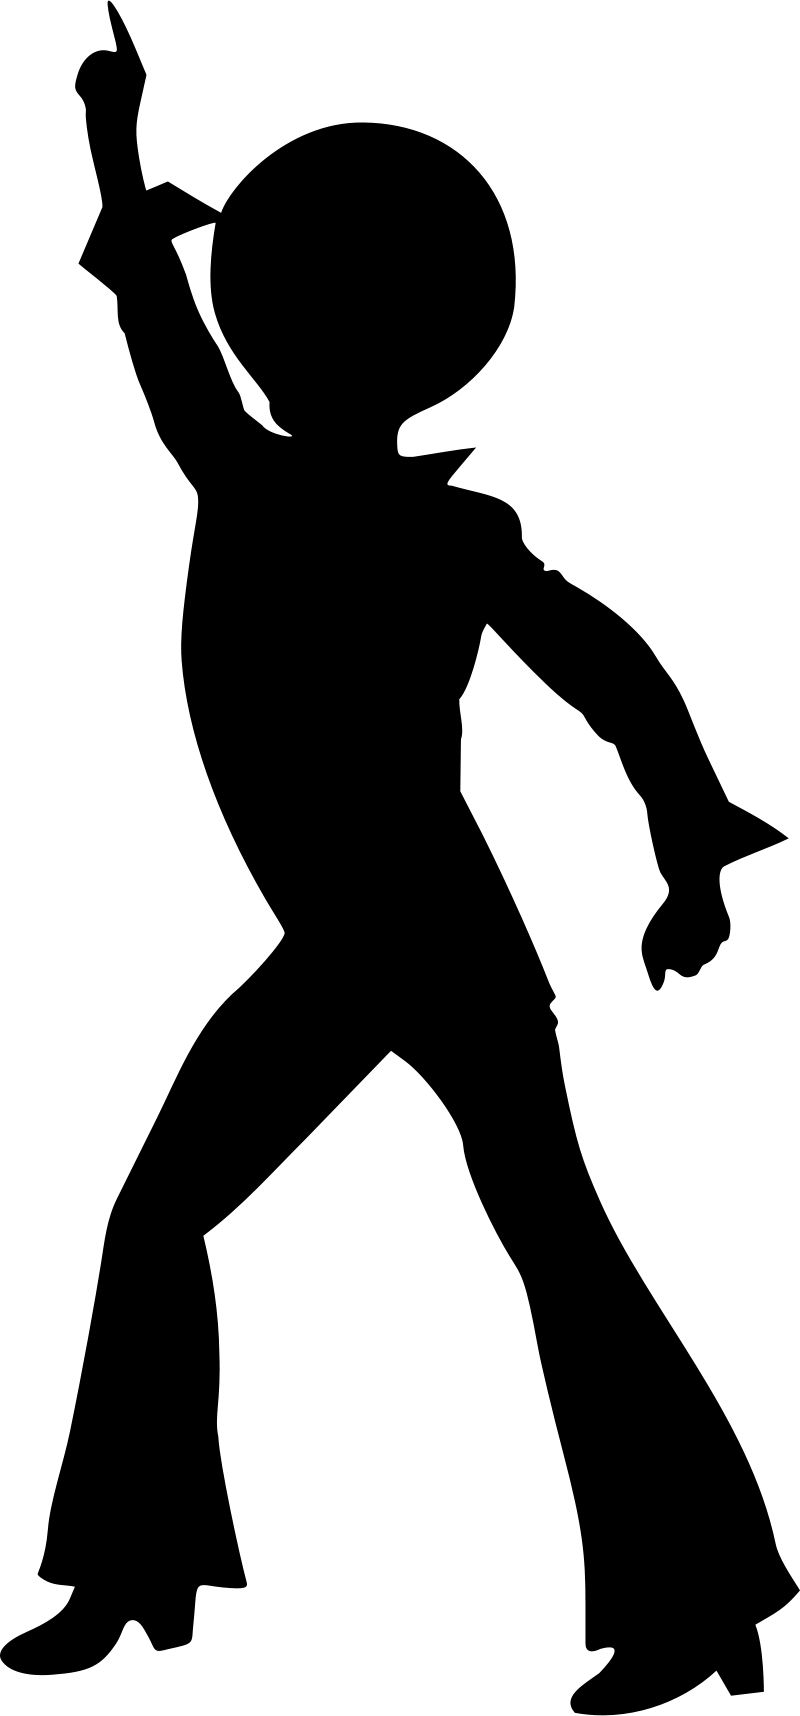 800x1716 Clipart